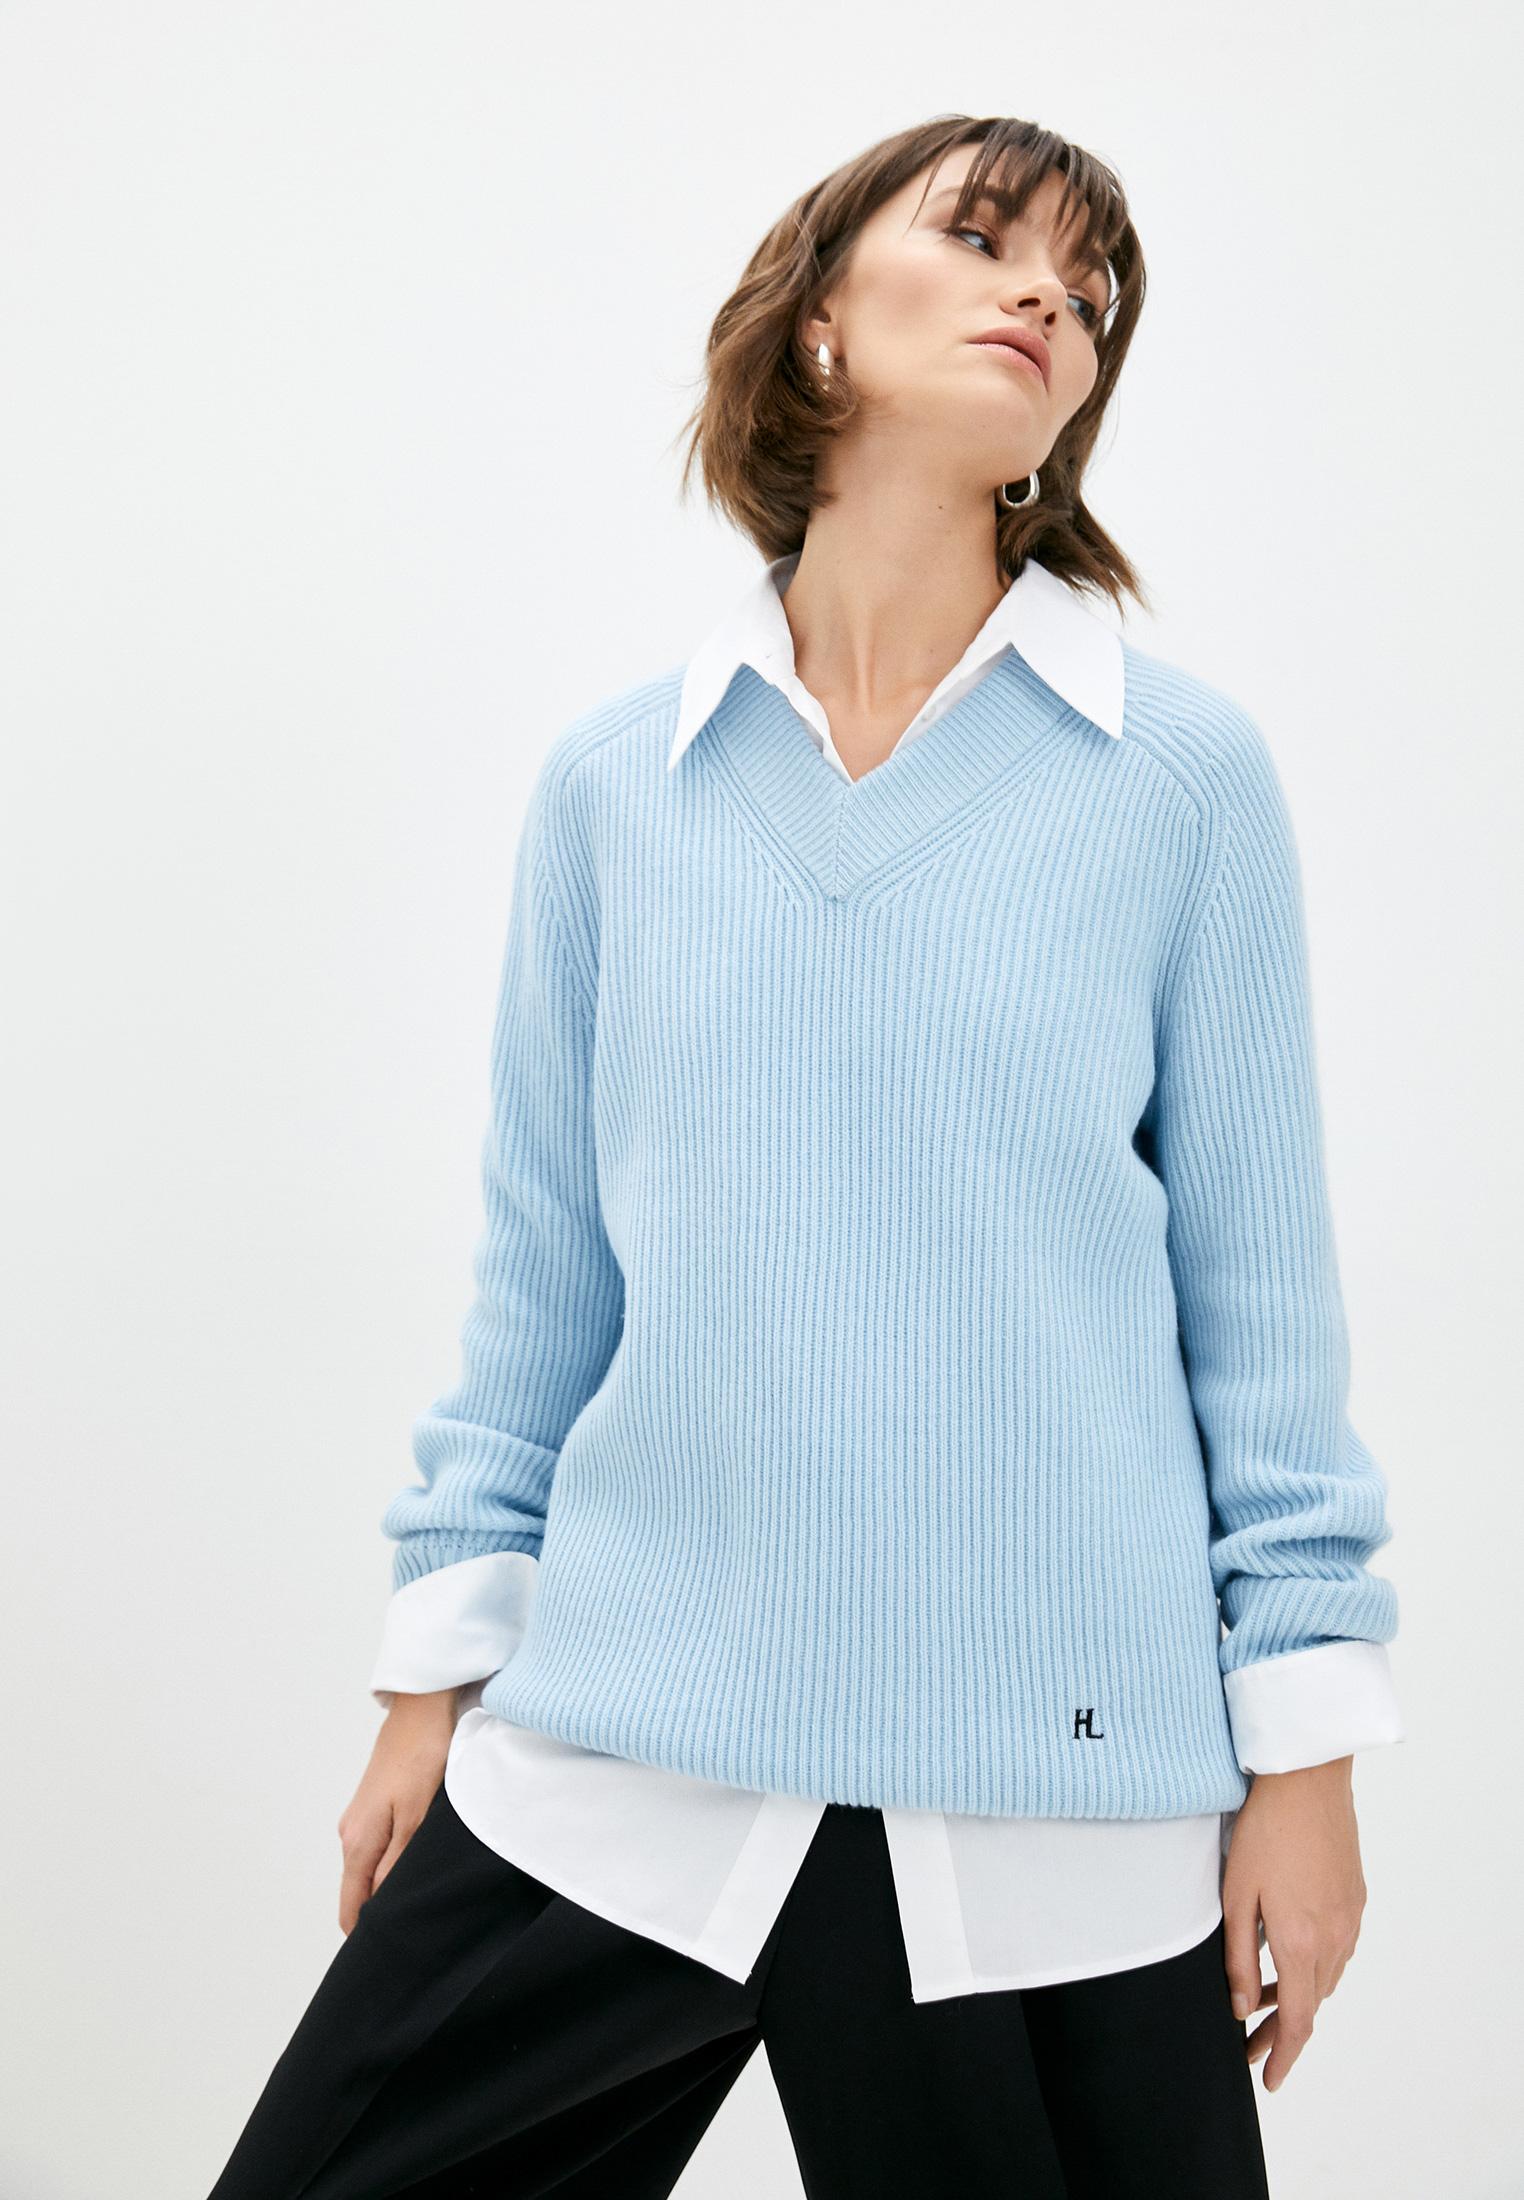 Пуловер HELMUT LANG Пуловер Helmut Lang